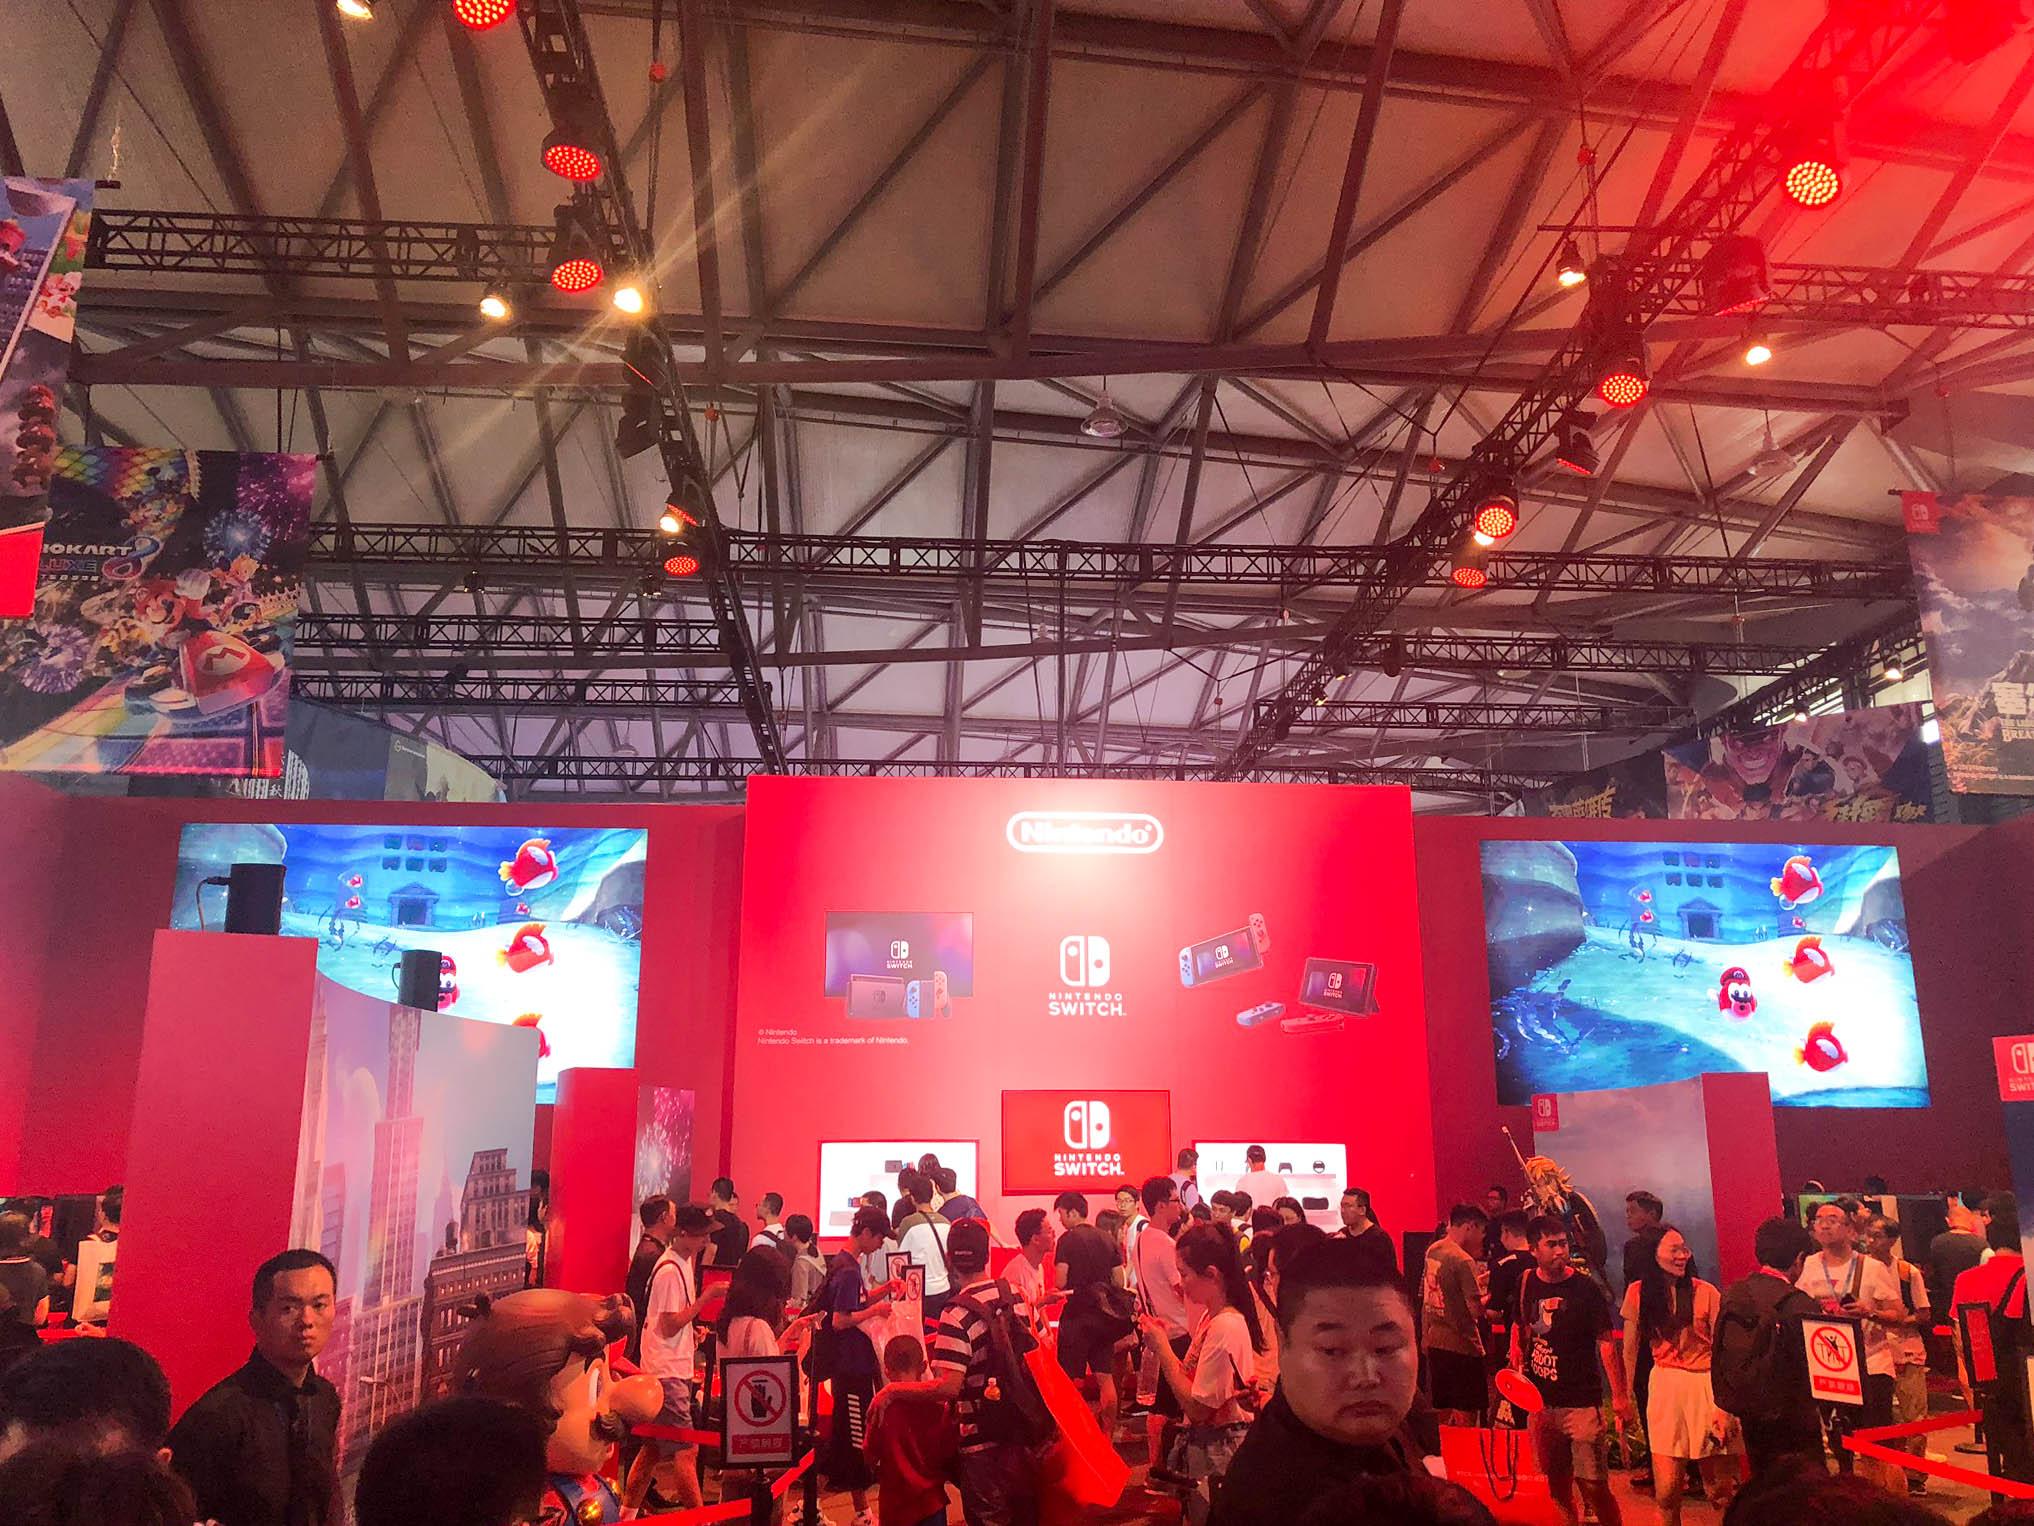 2019 ChinaJoy 中国国际数码互动娱乐展览会 游玩 第44张